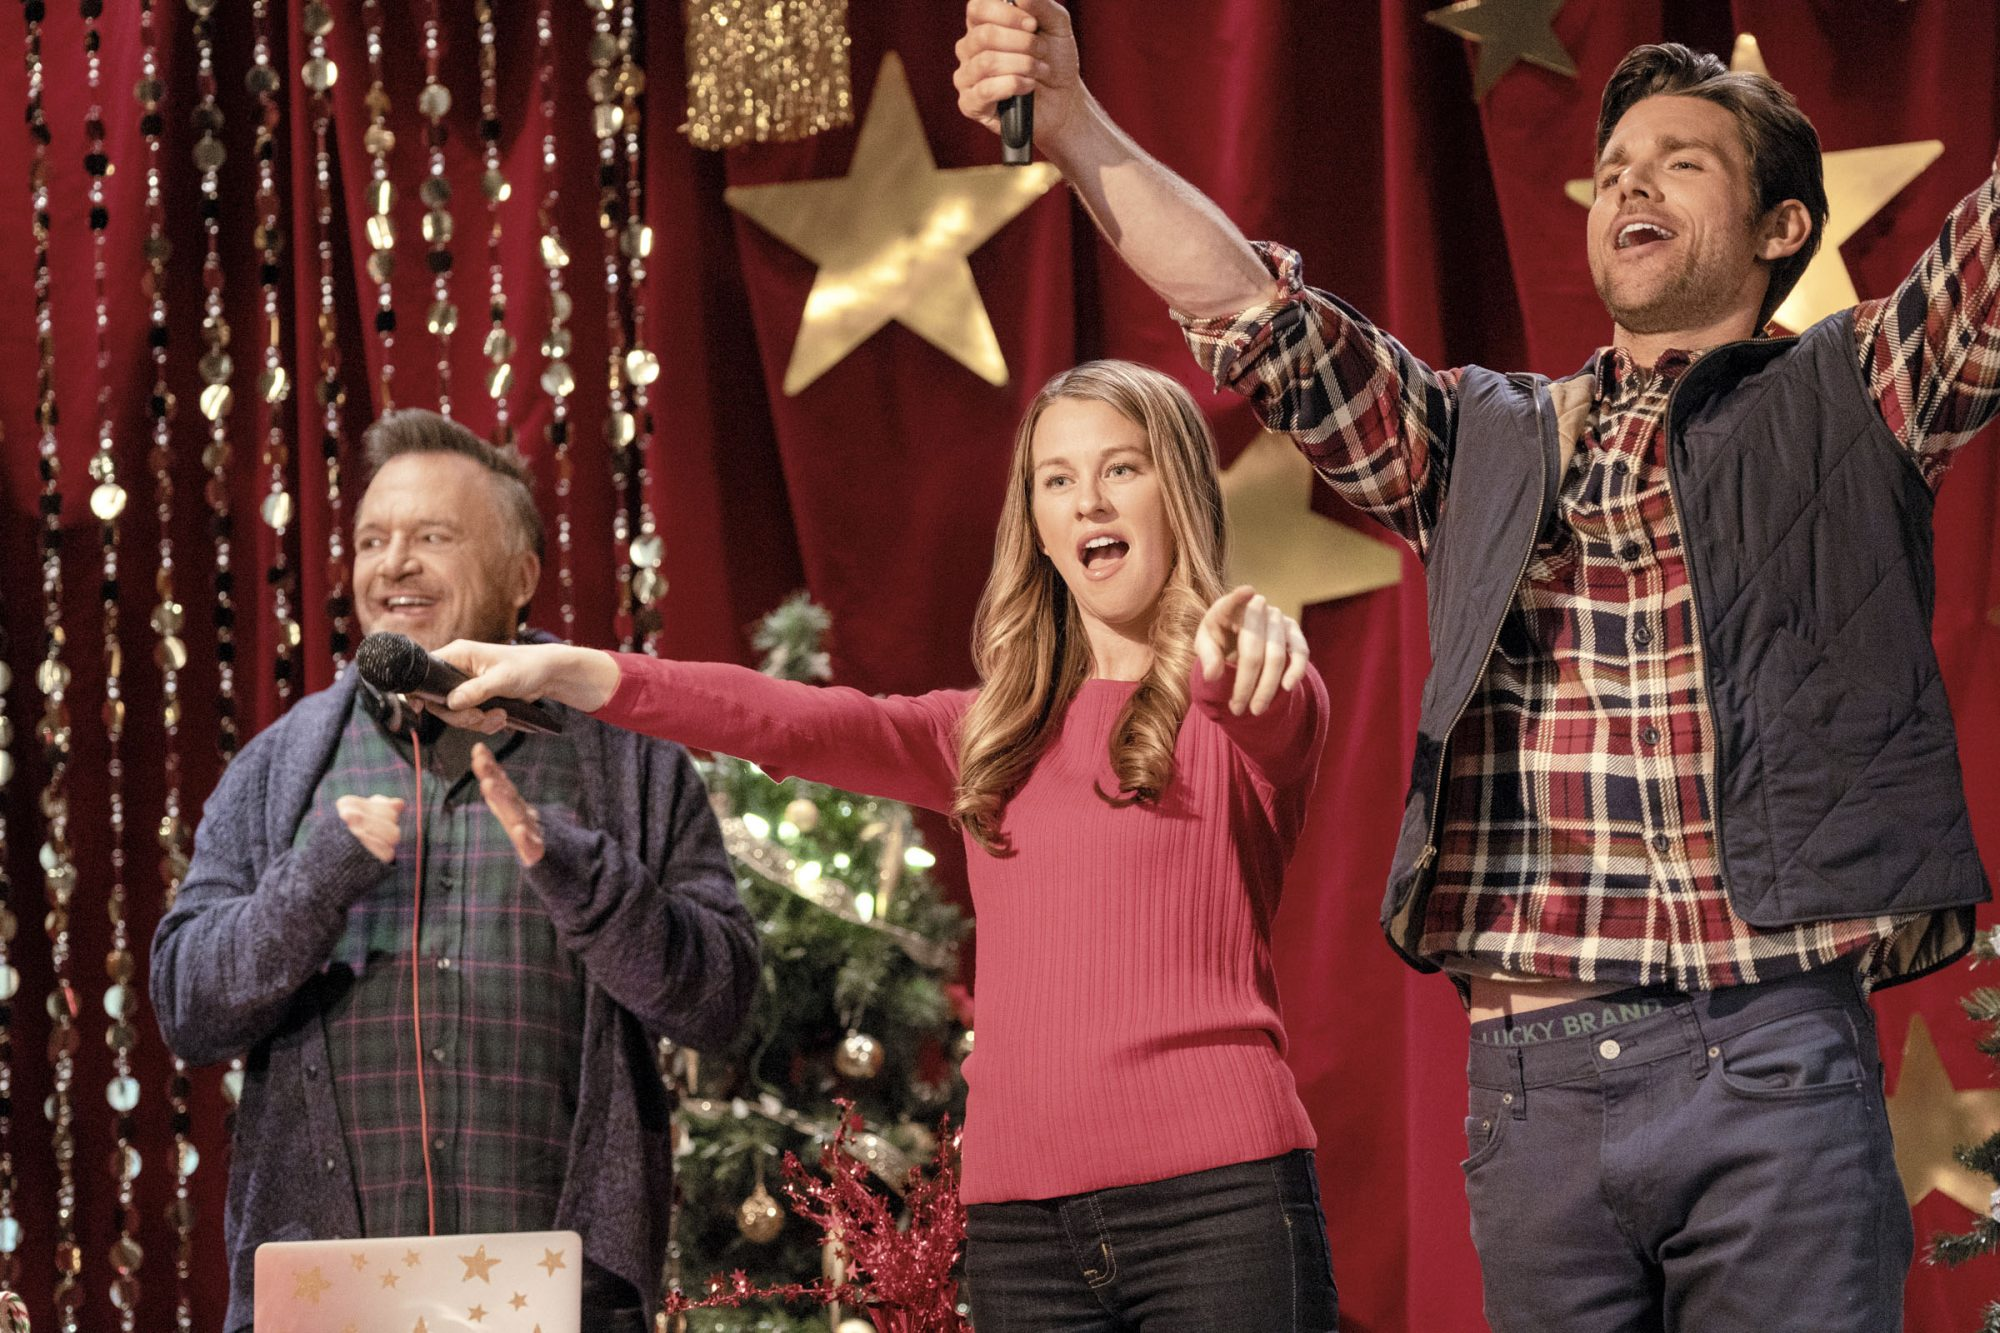 A Christmas Scavenger HuntTom Arnold, Kim Shaw, Kevin McGarryCR: Crown Media